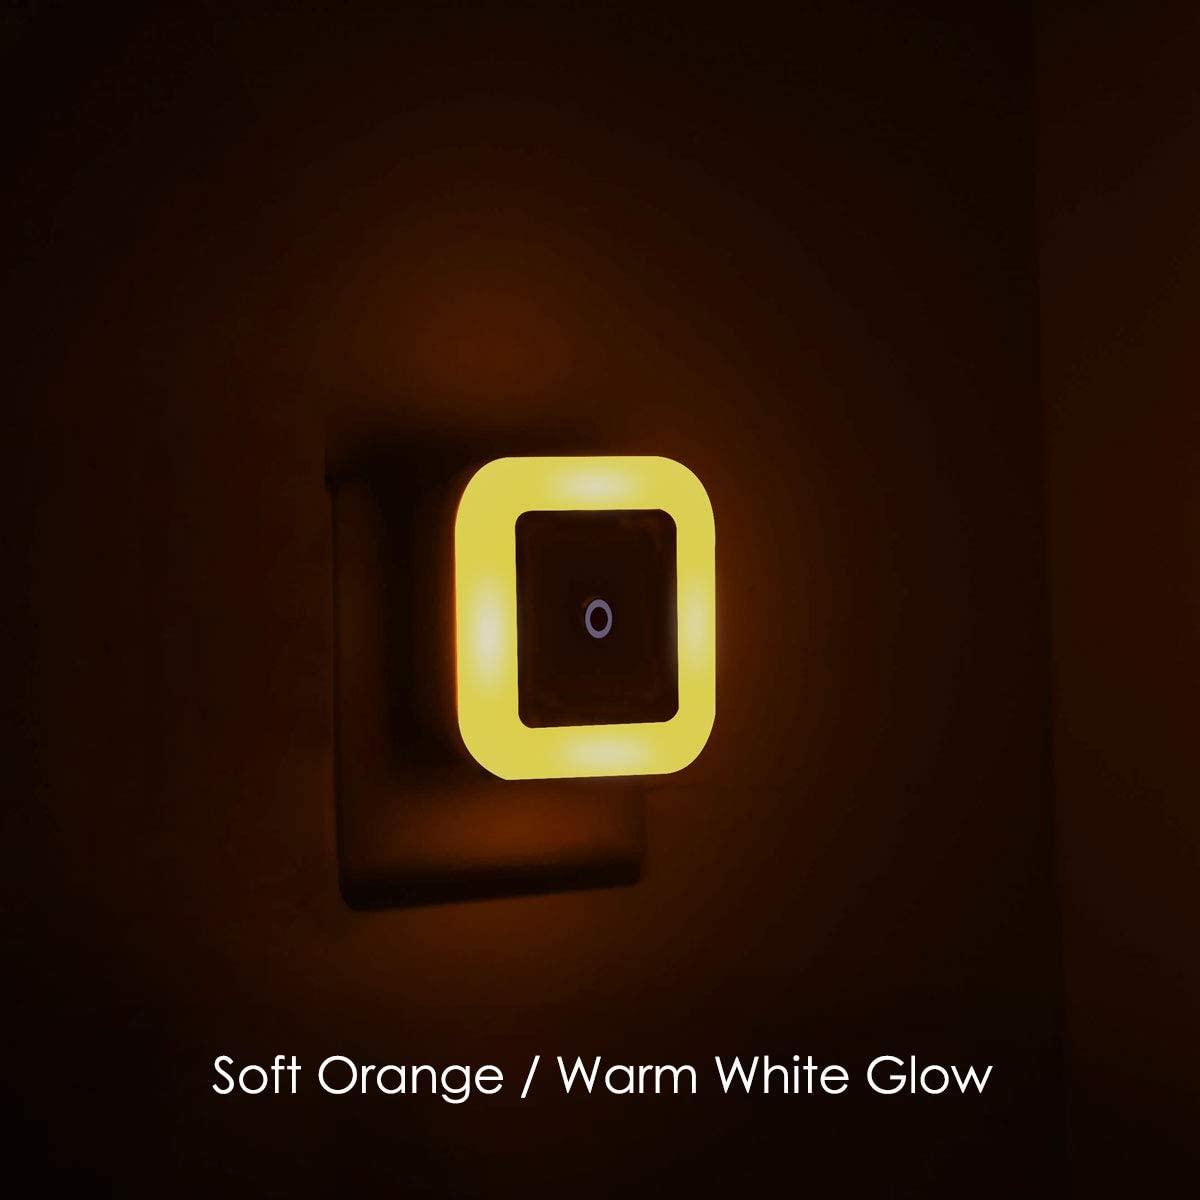 Soft Orange/Warm White/Amber Glow, 0.5W Plug in Night Lights, Dusk to Dawn Senor, 2 Pieces